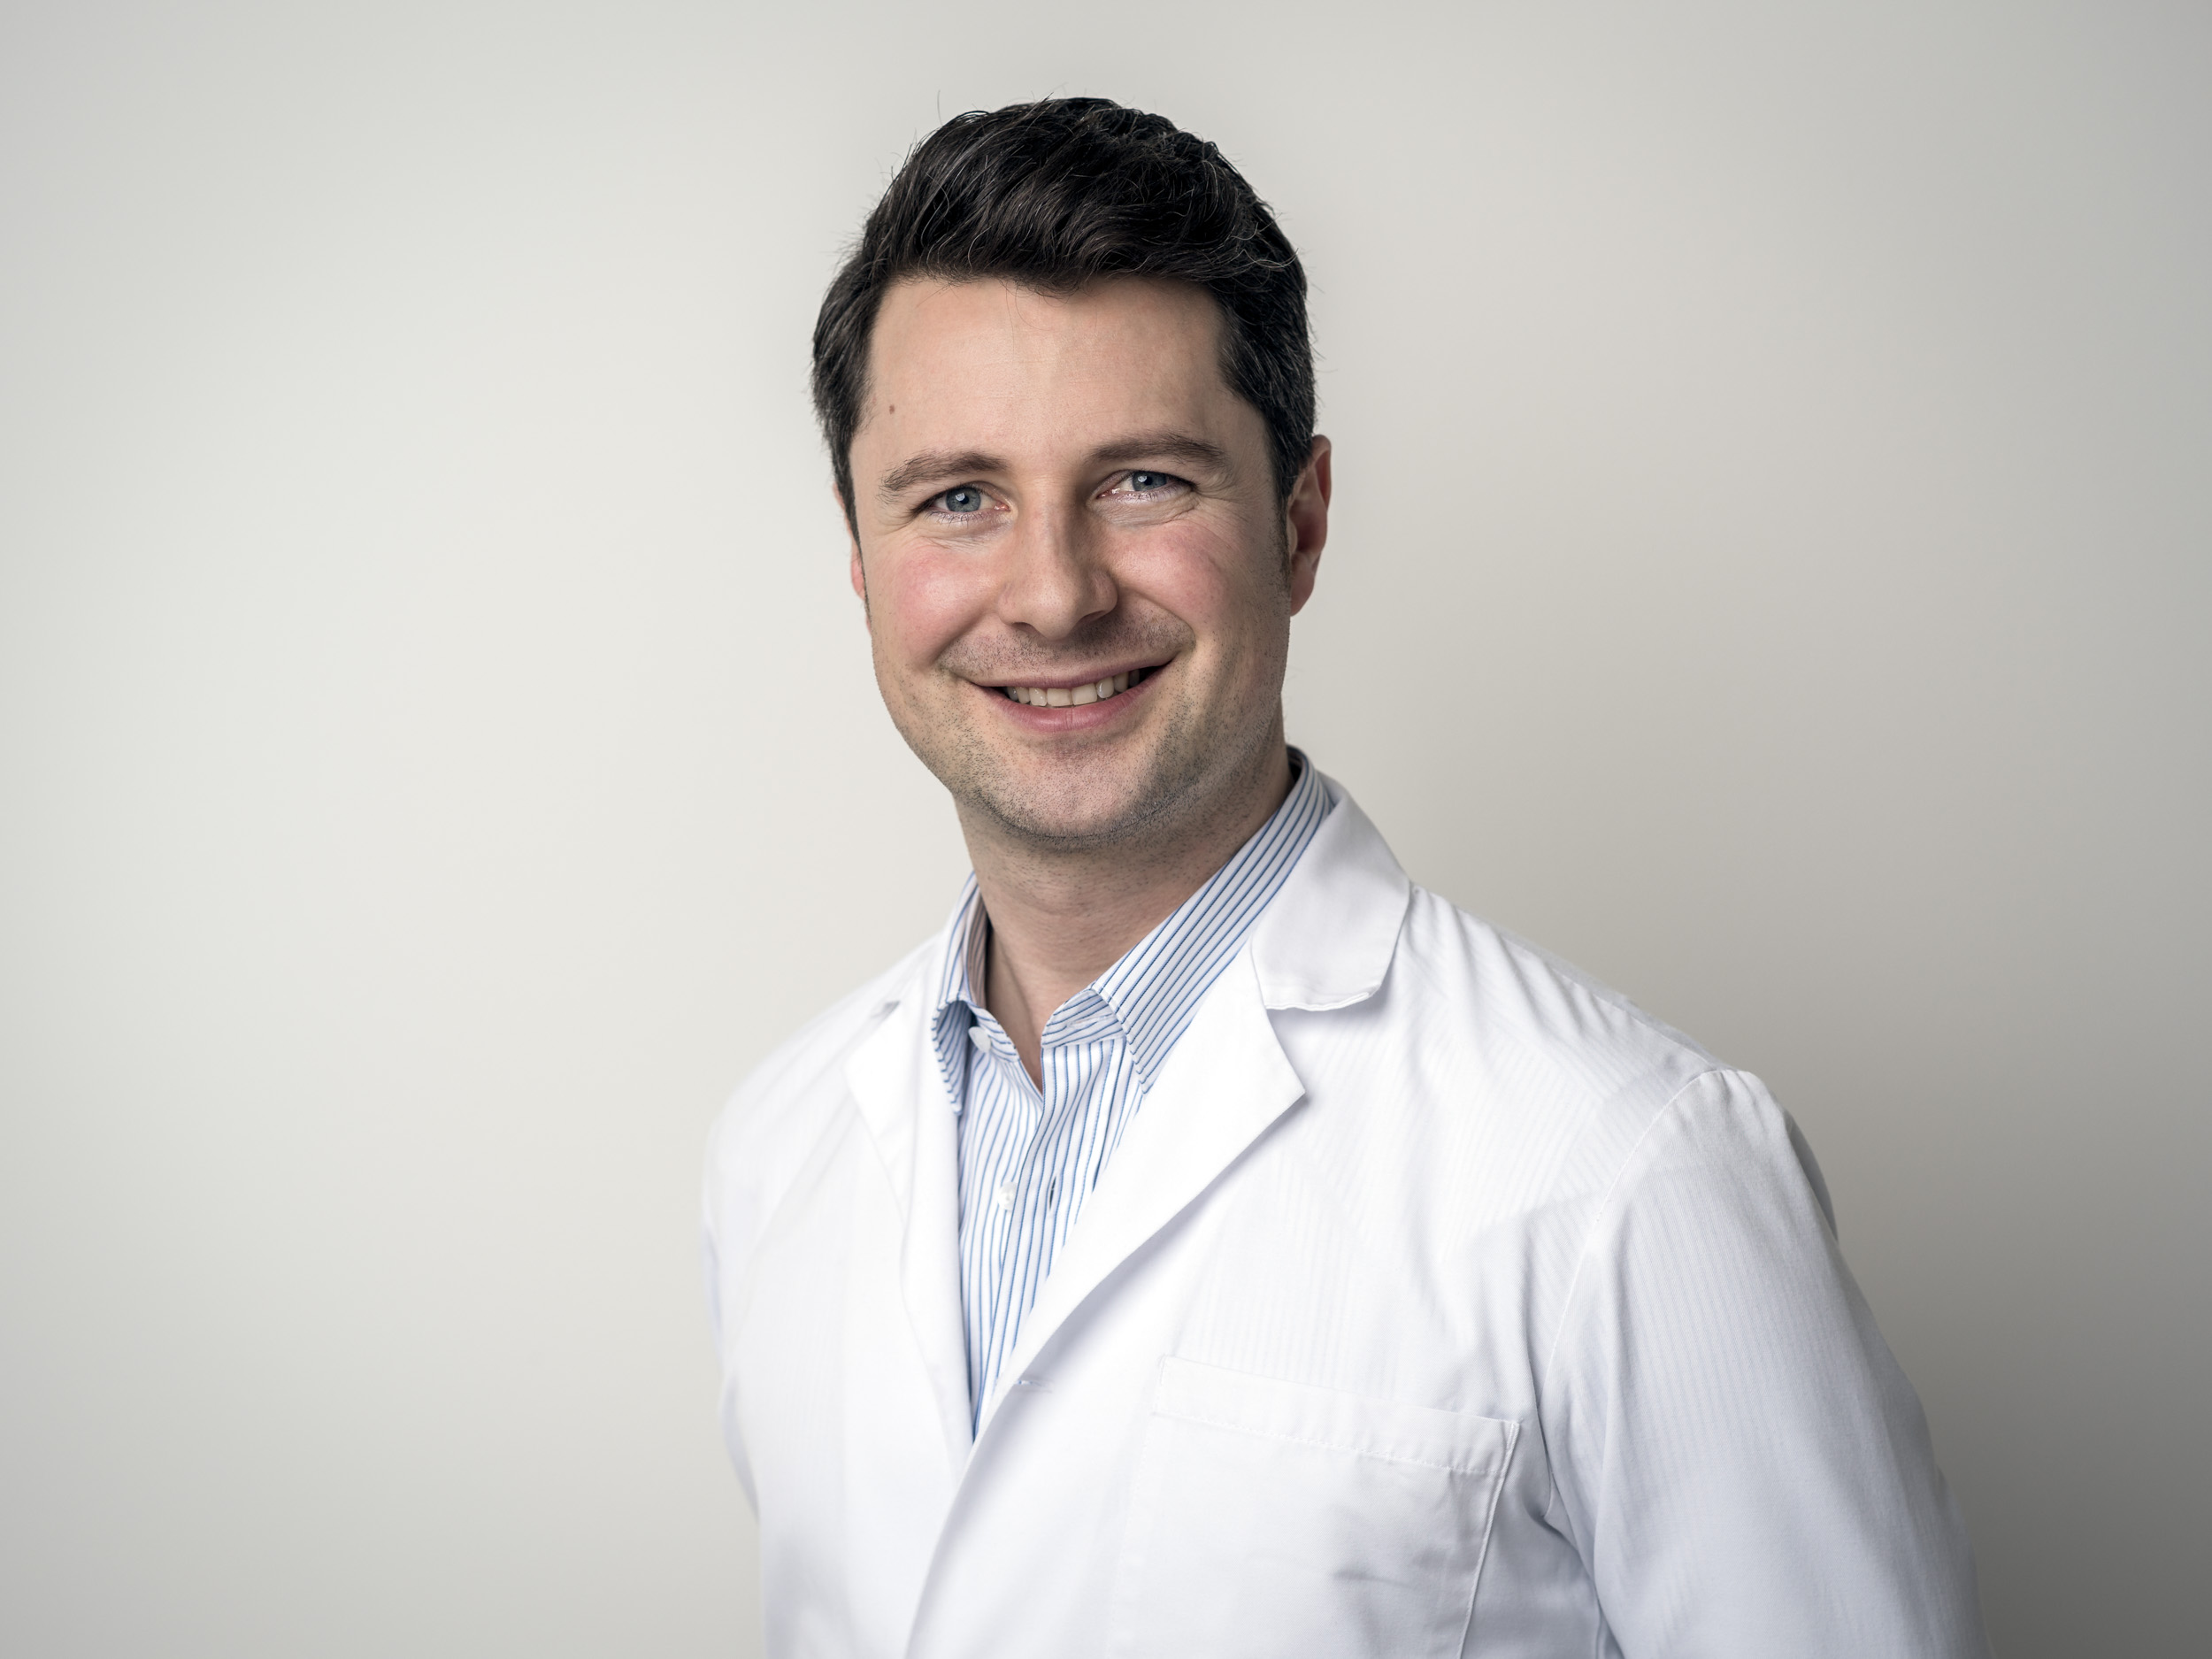 Dermatologie Klinik Zürich - Dr. med. Benjamin Miller